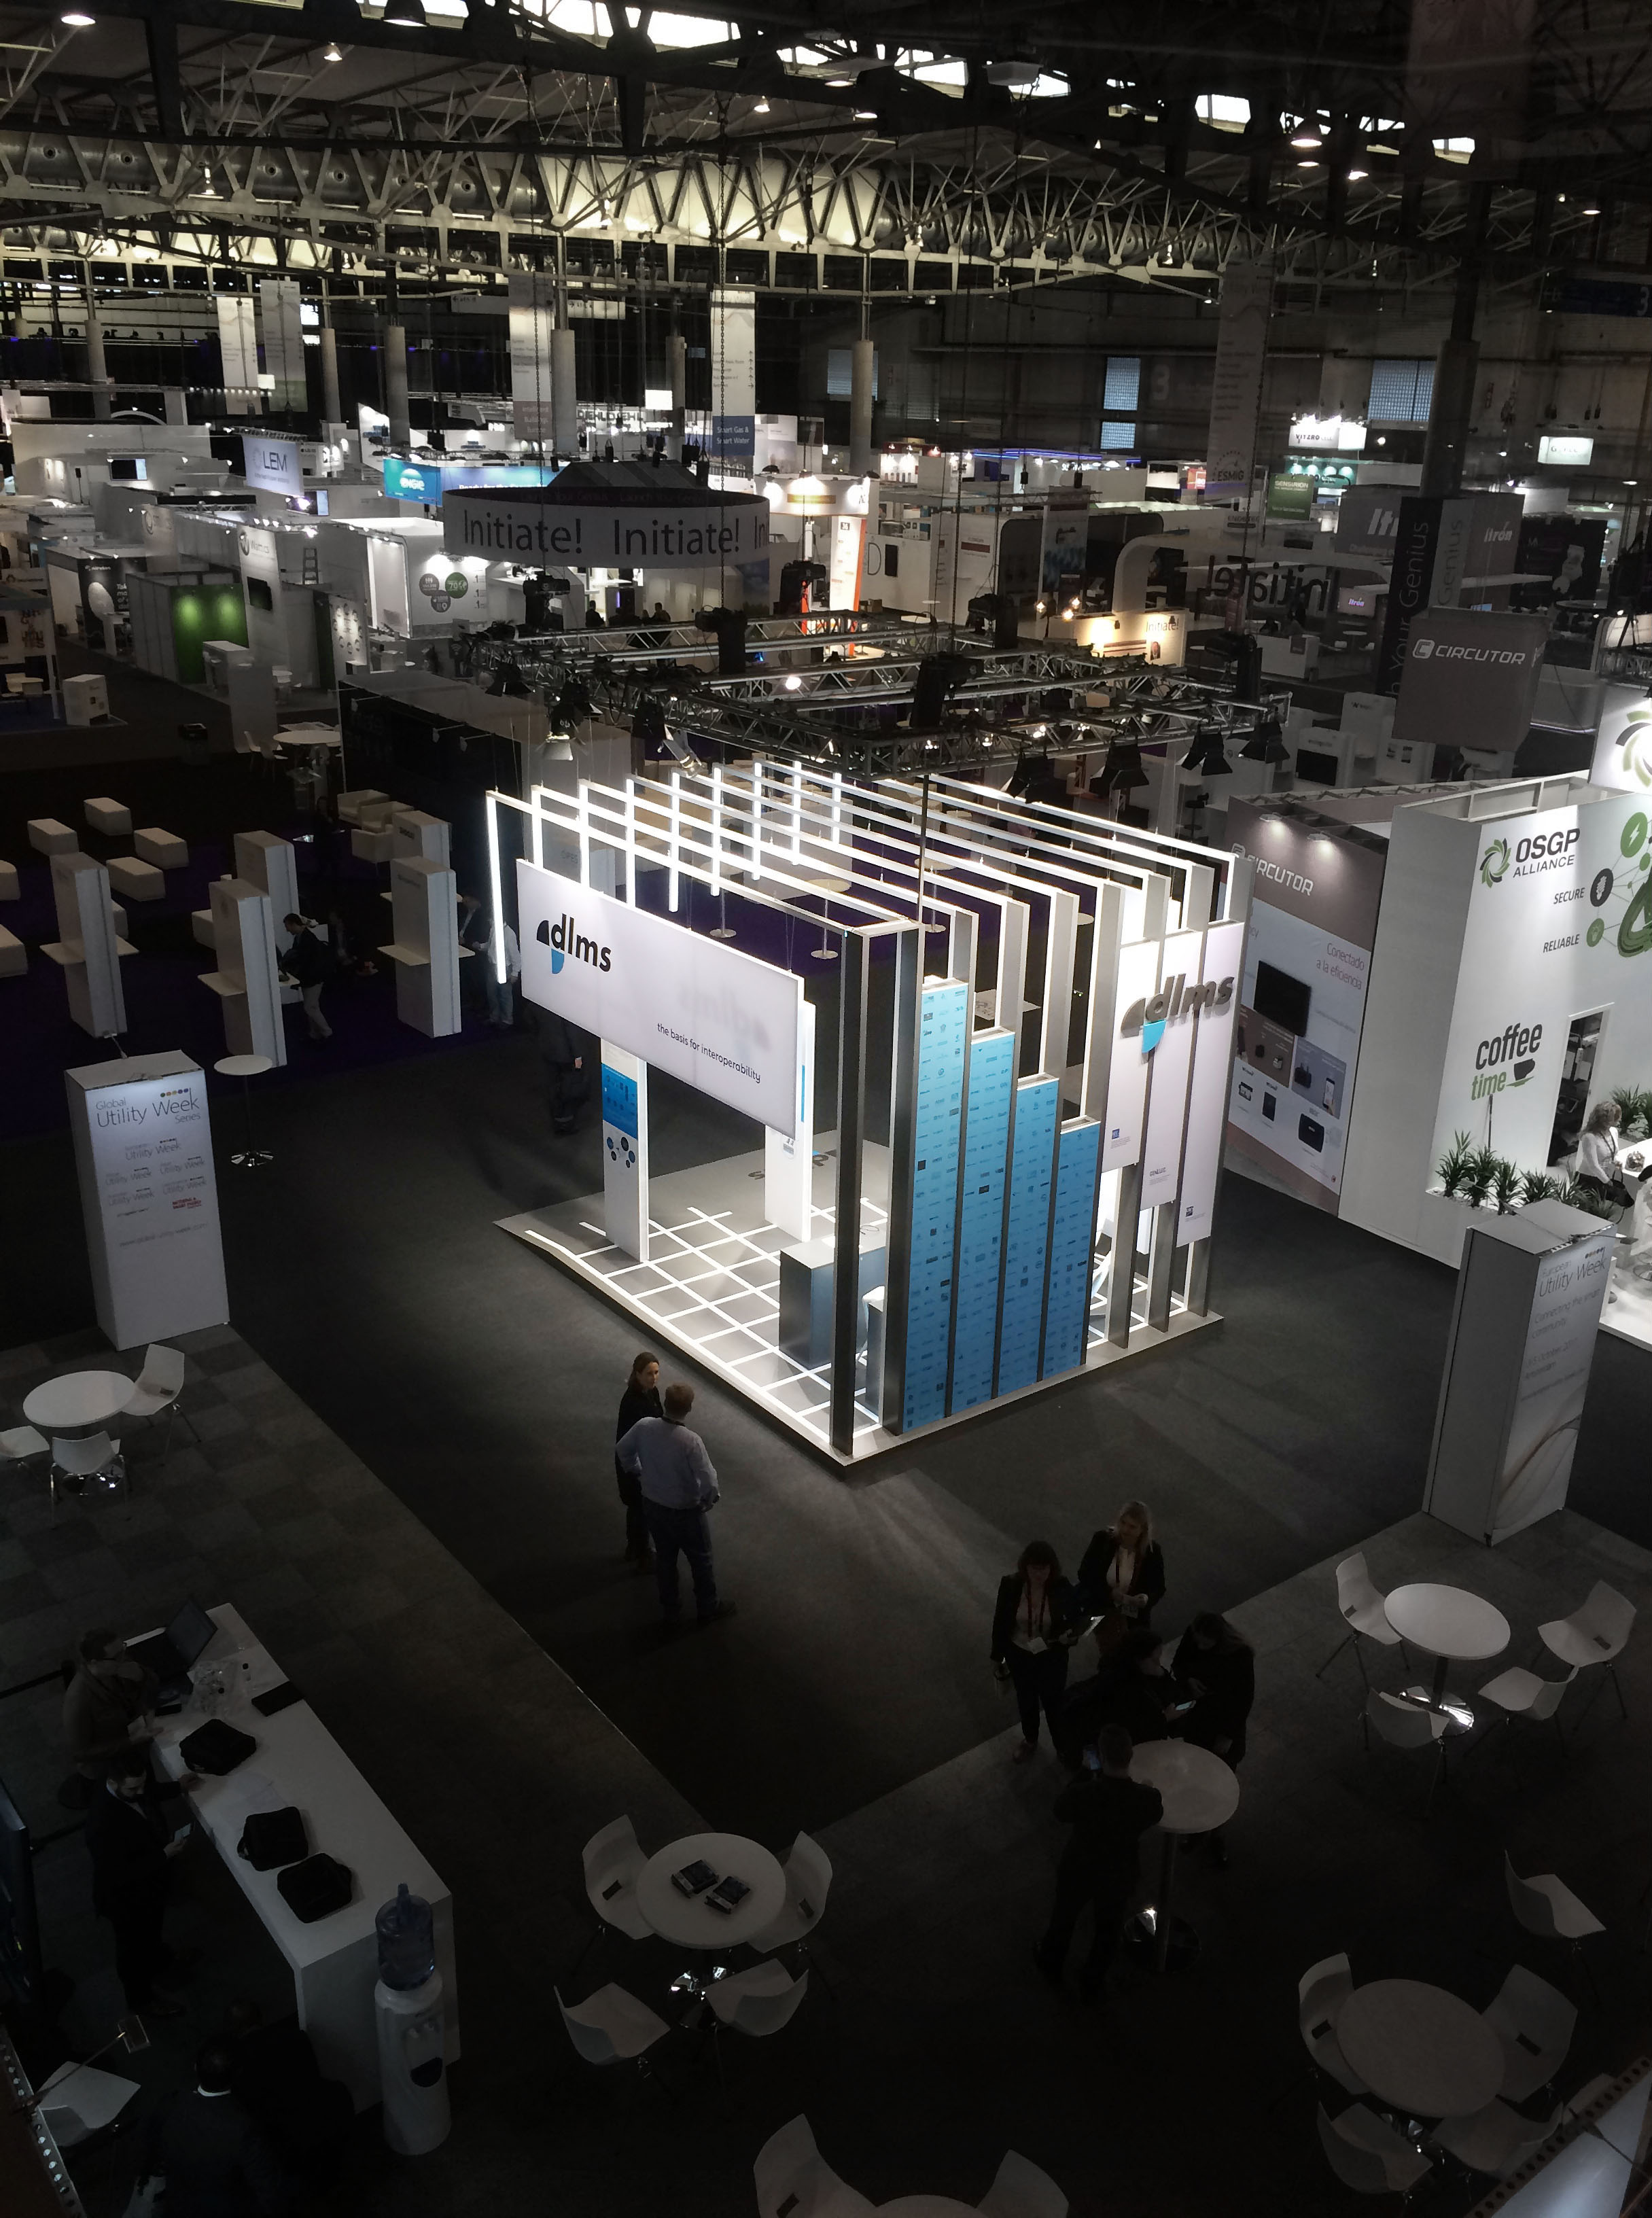 dlms_tradefair-exhibition-design_coordination-berlin_03.jpg